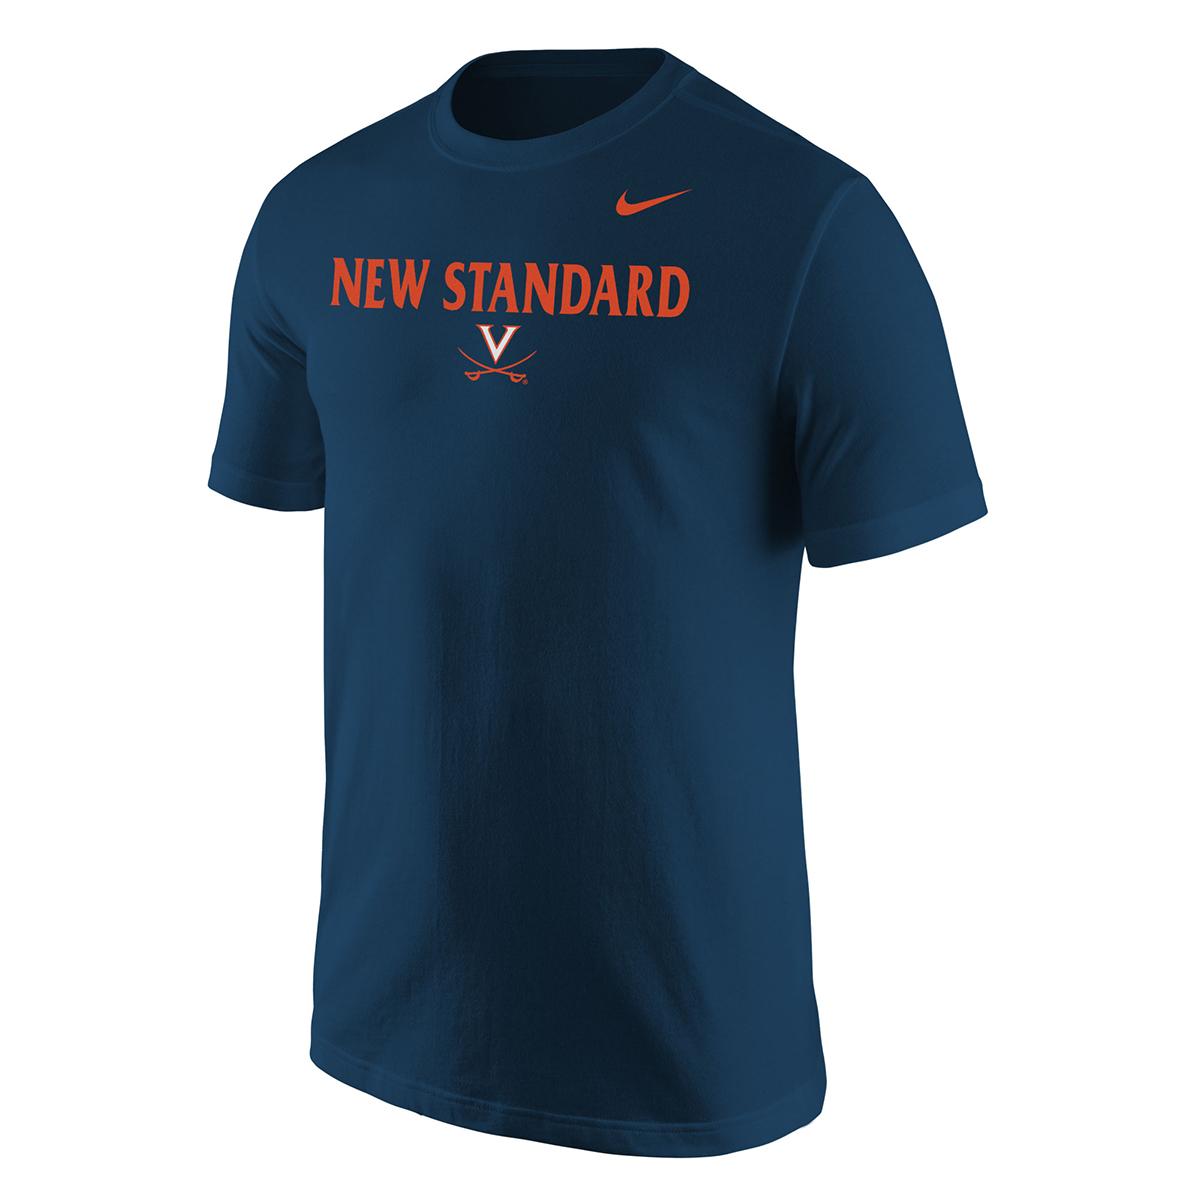 University of Virginia 2018 New Standard T-shirt